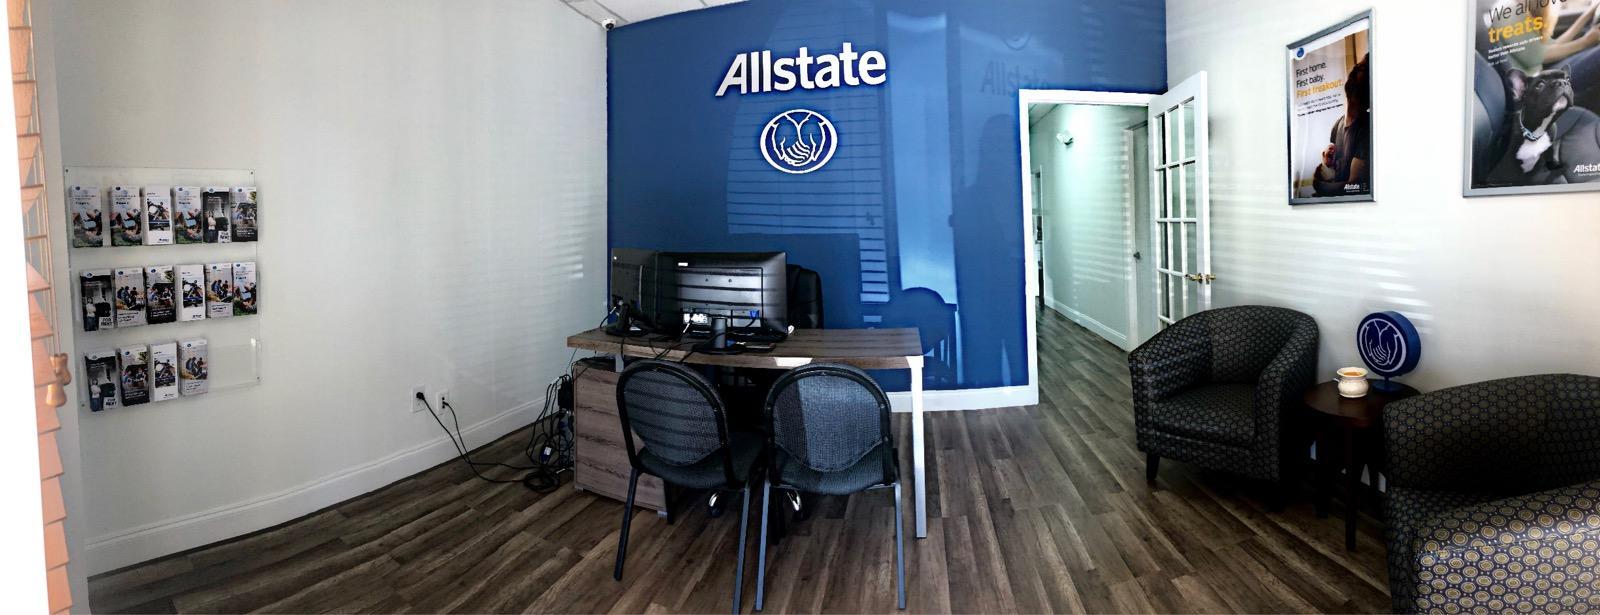 Antonio Rodriguez: Allstate Insurance image 2